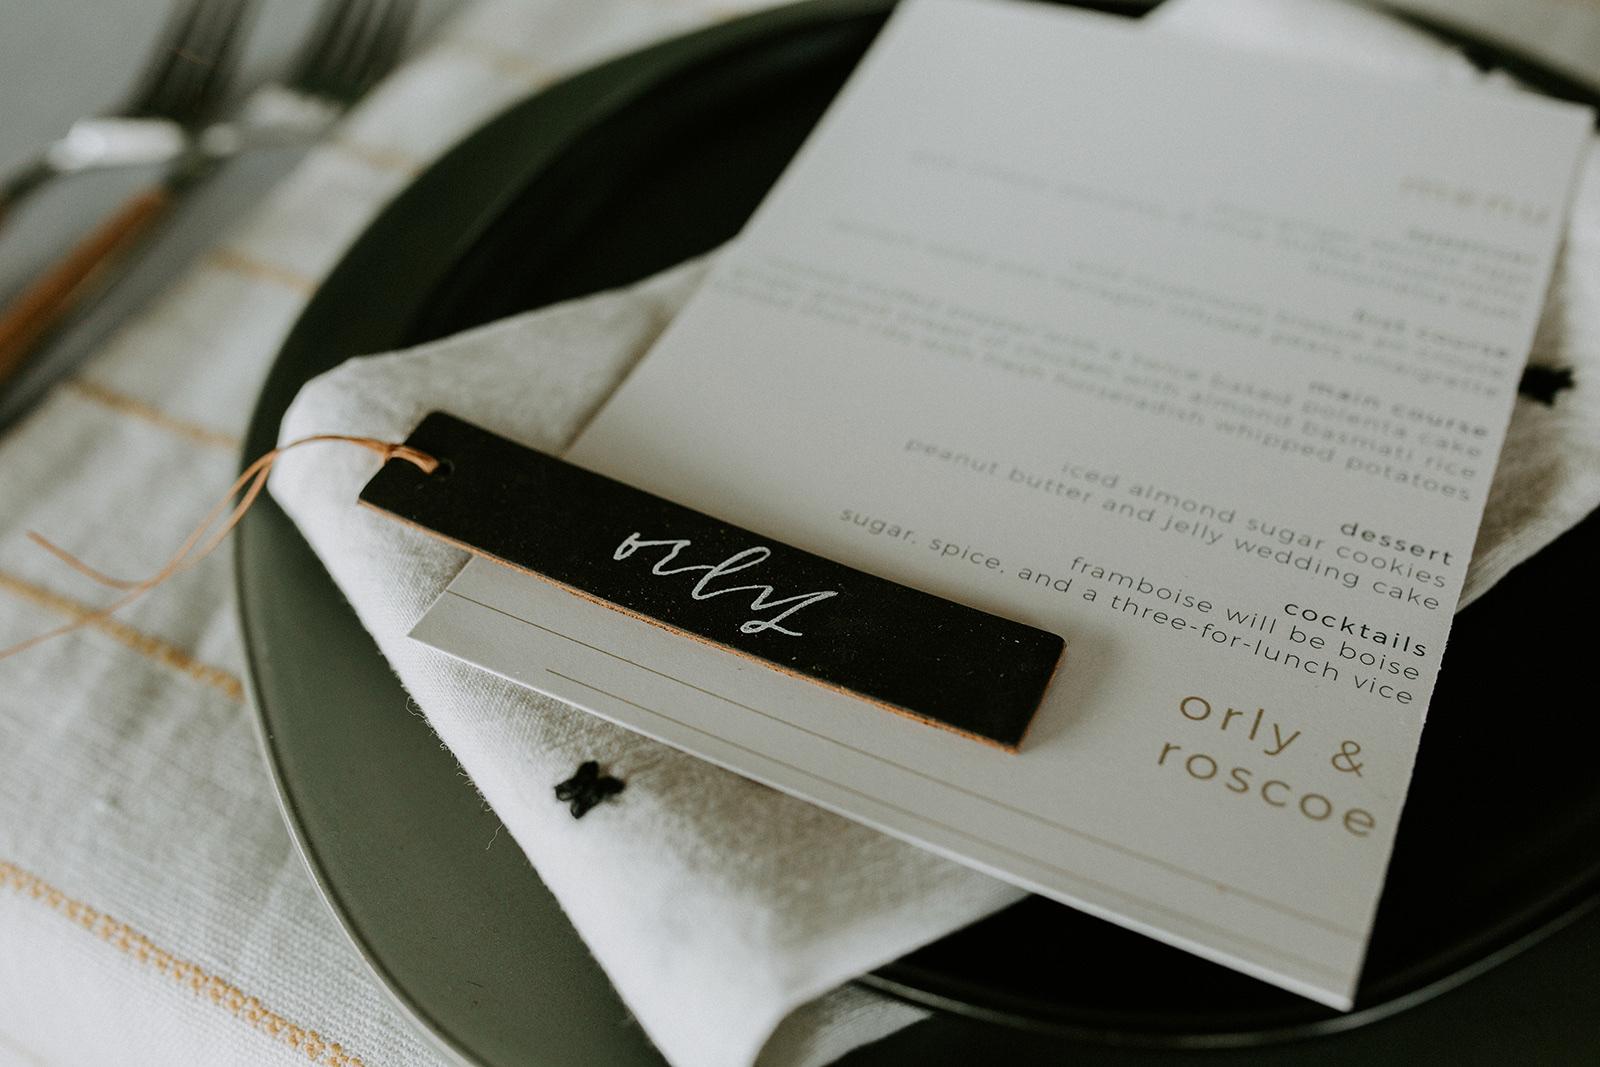 bluestem_hall_champaign_wedding_photographer_wright_photographs_collaboration_0069.jpg